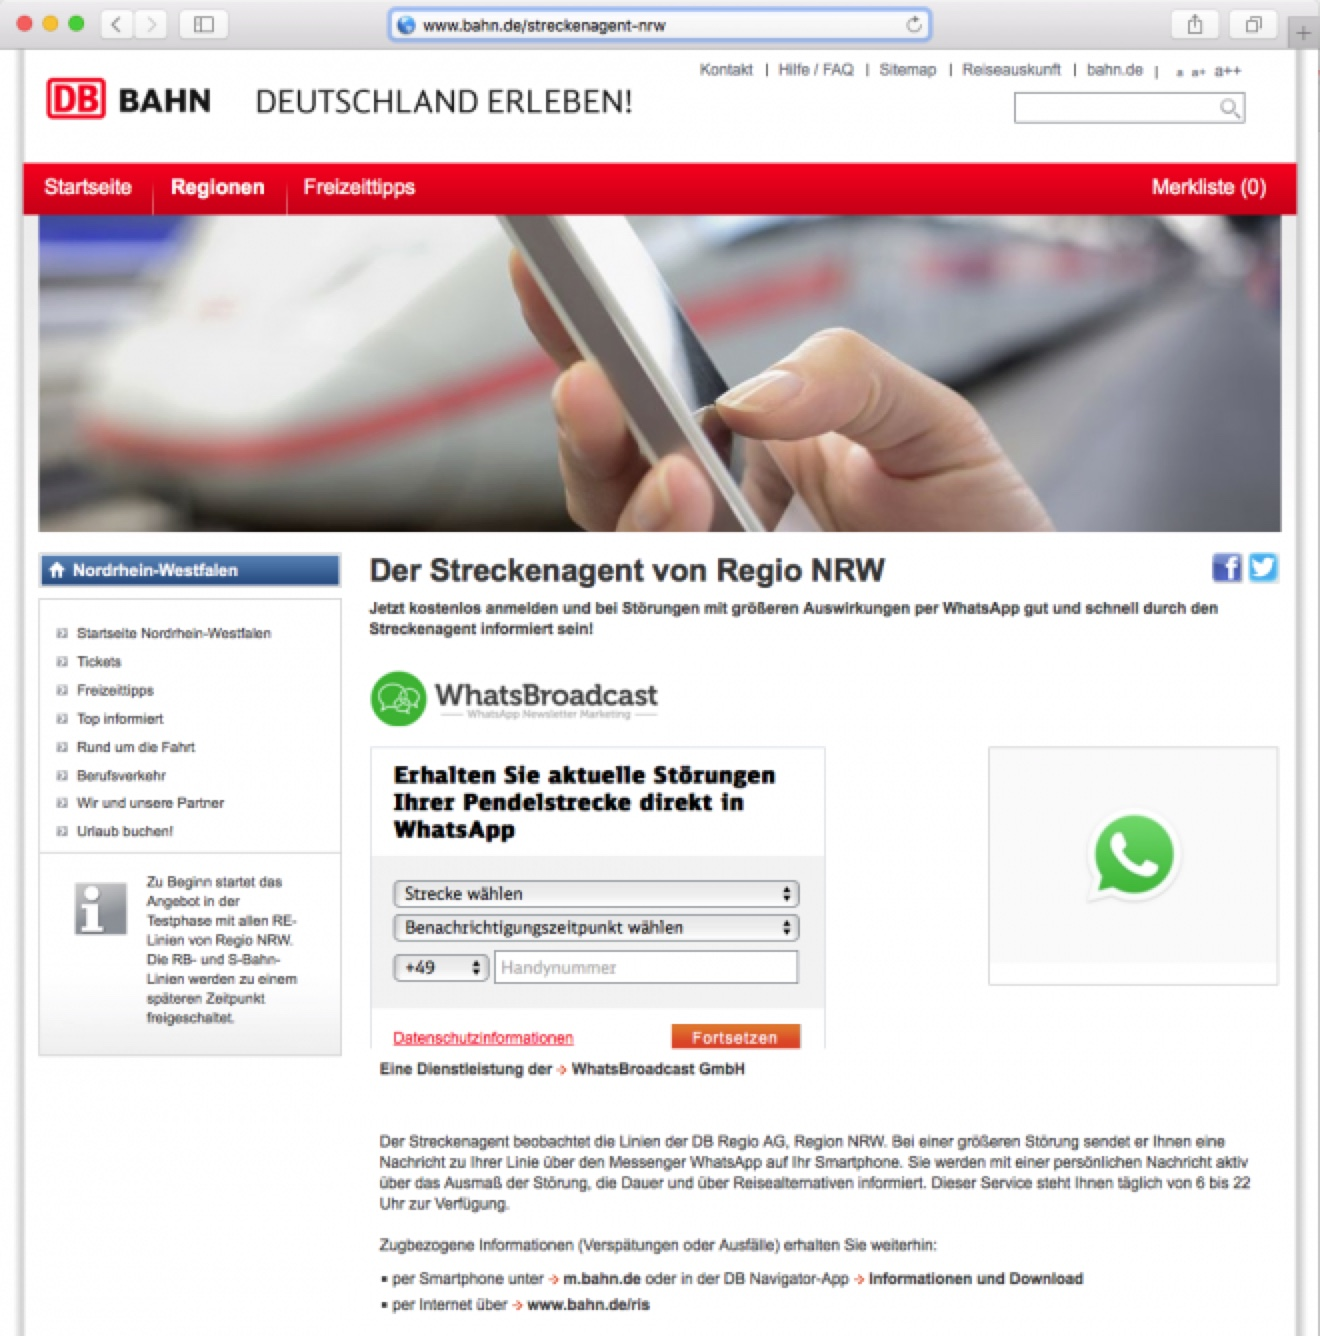 Fantastisch Builder Websites Fortsetzen Galerie - Entry Level Resume ...